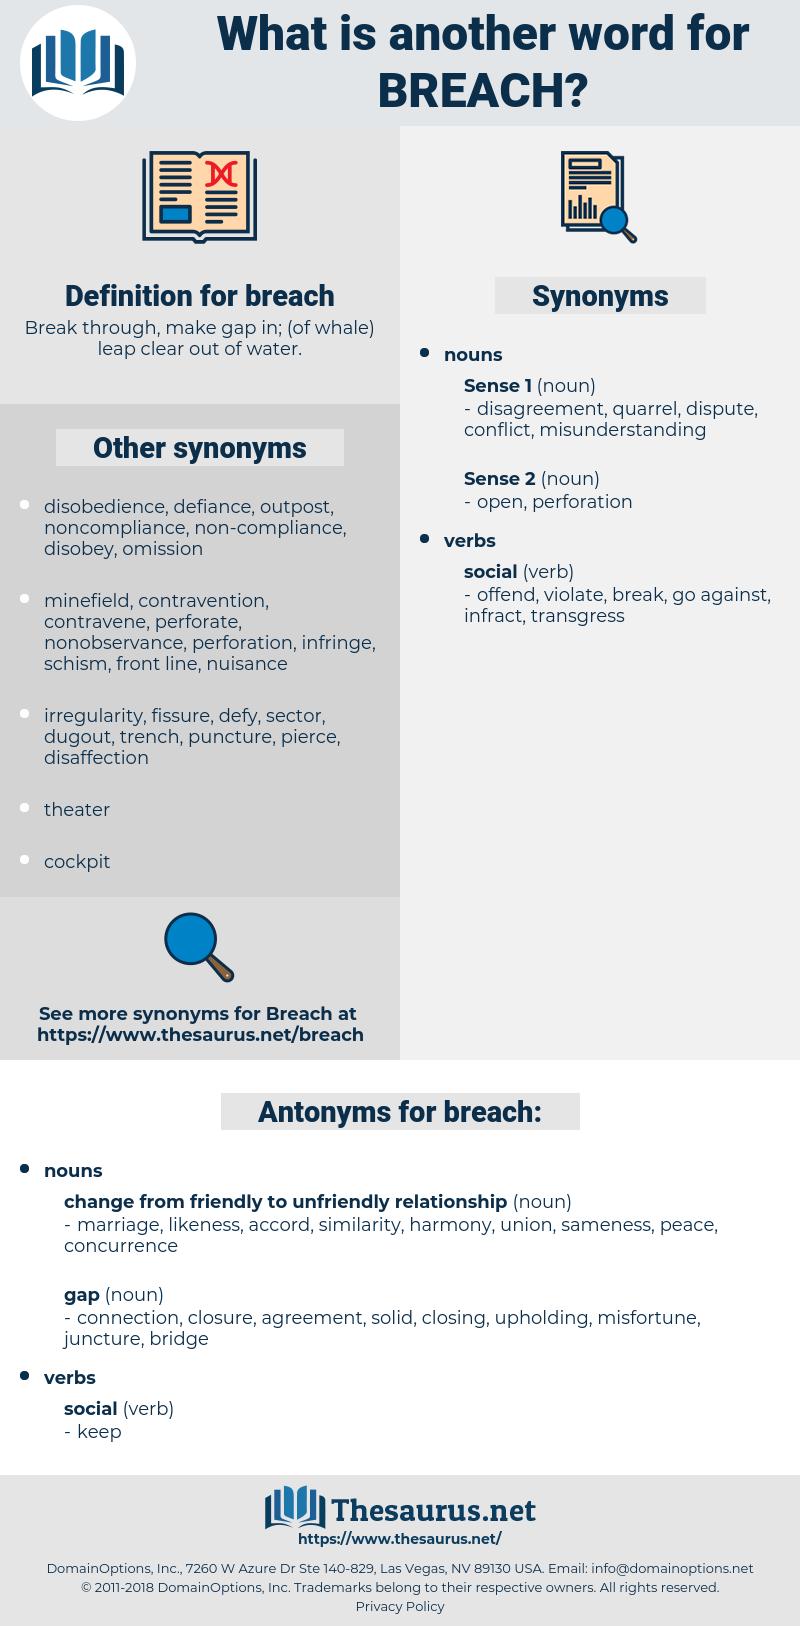 breach, synonym breach, another word for breach, words like breach, thesaurus breach